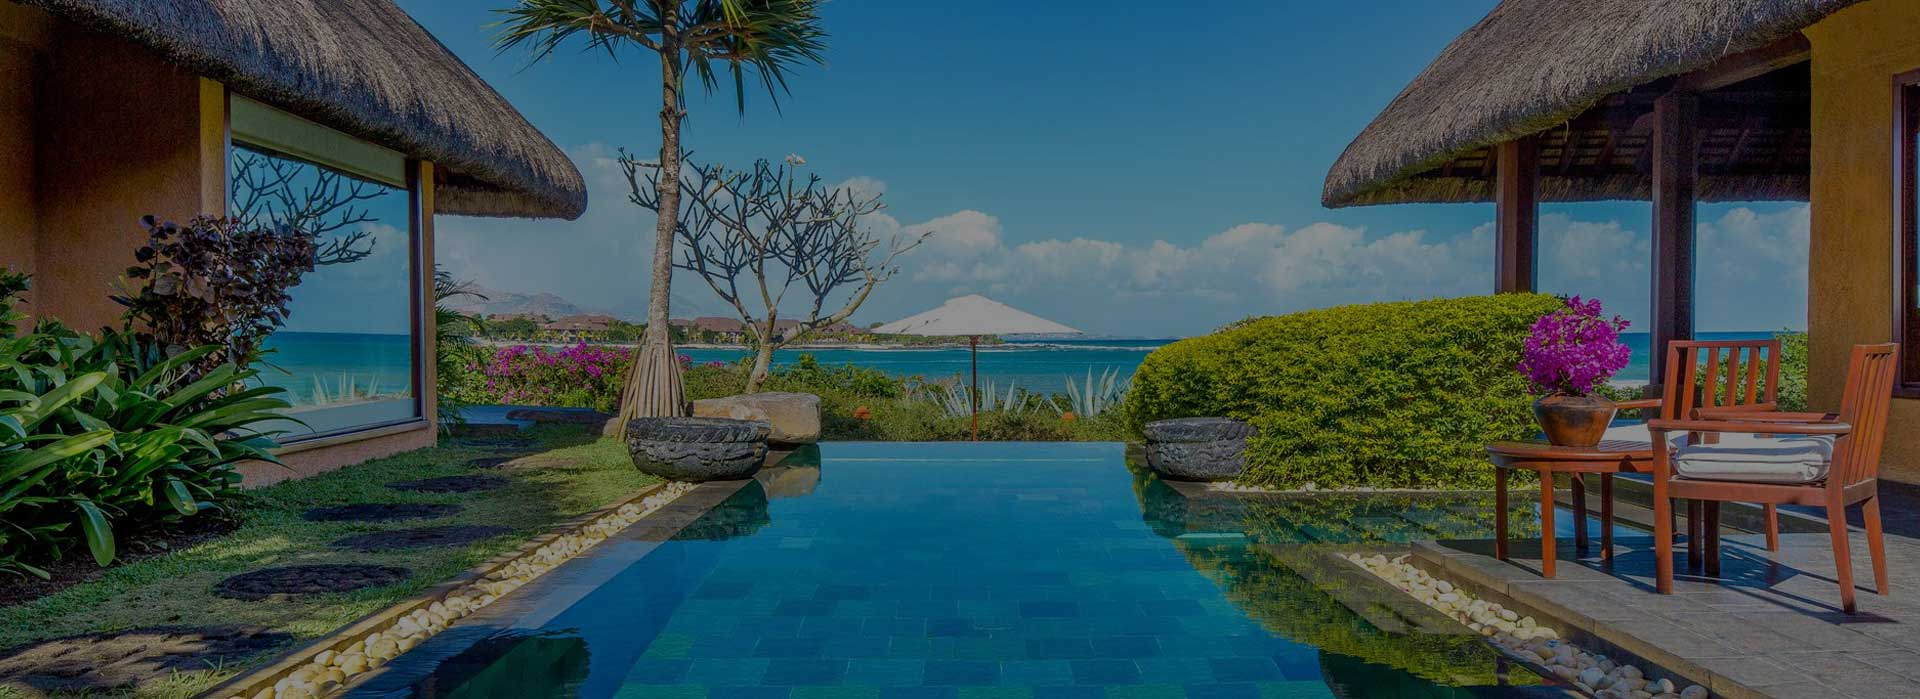 immobilier vacances